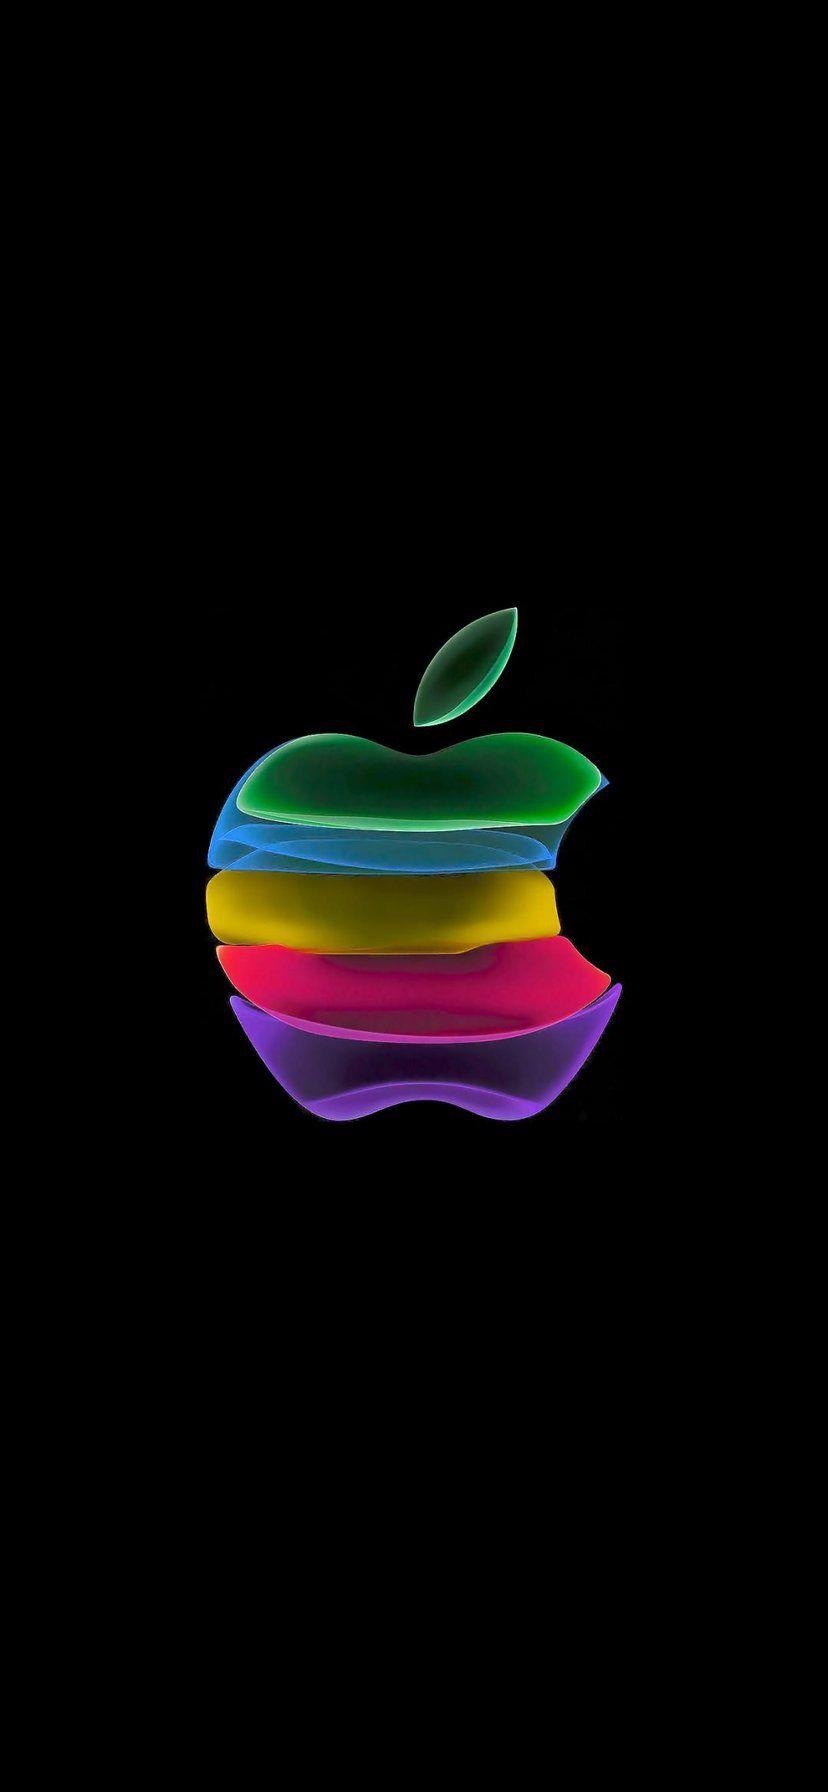 Iphone 11 Wallpaper Hd 4k Download Apple Logo Wallpaper Iphone Apple Iphone Wallpaper Hd Apple Logo Wallpaper